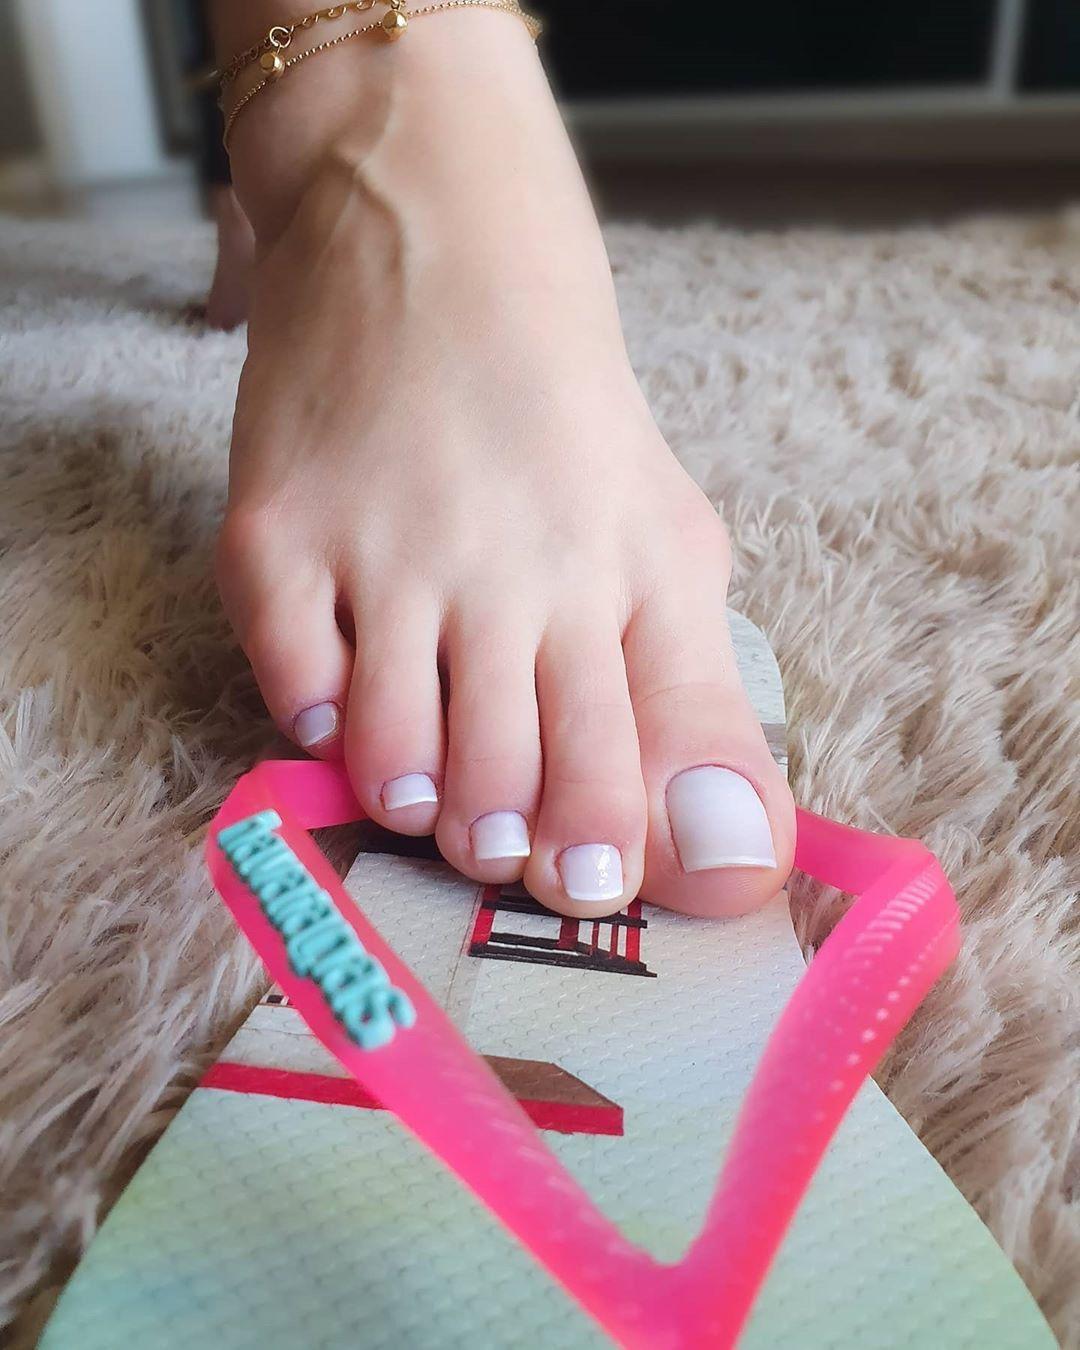 Pin on Gorgeous feet & legs & heels